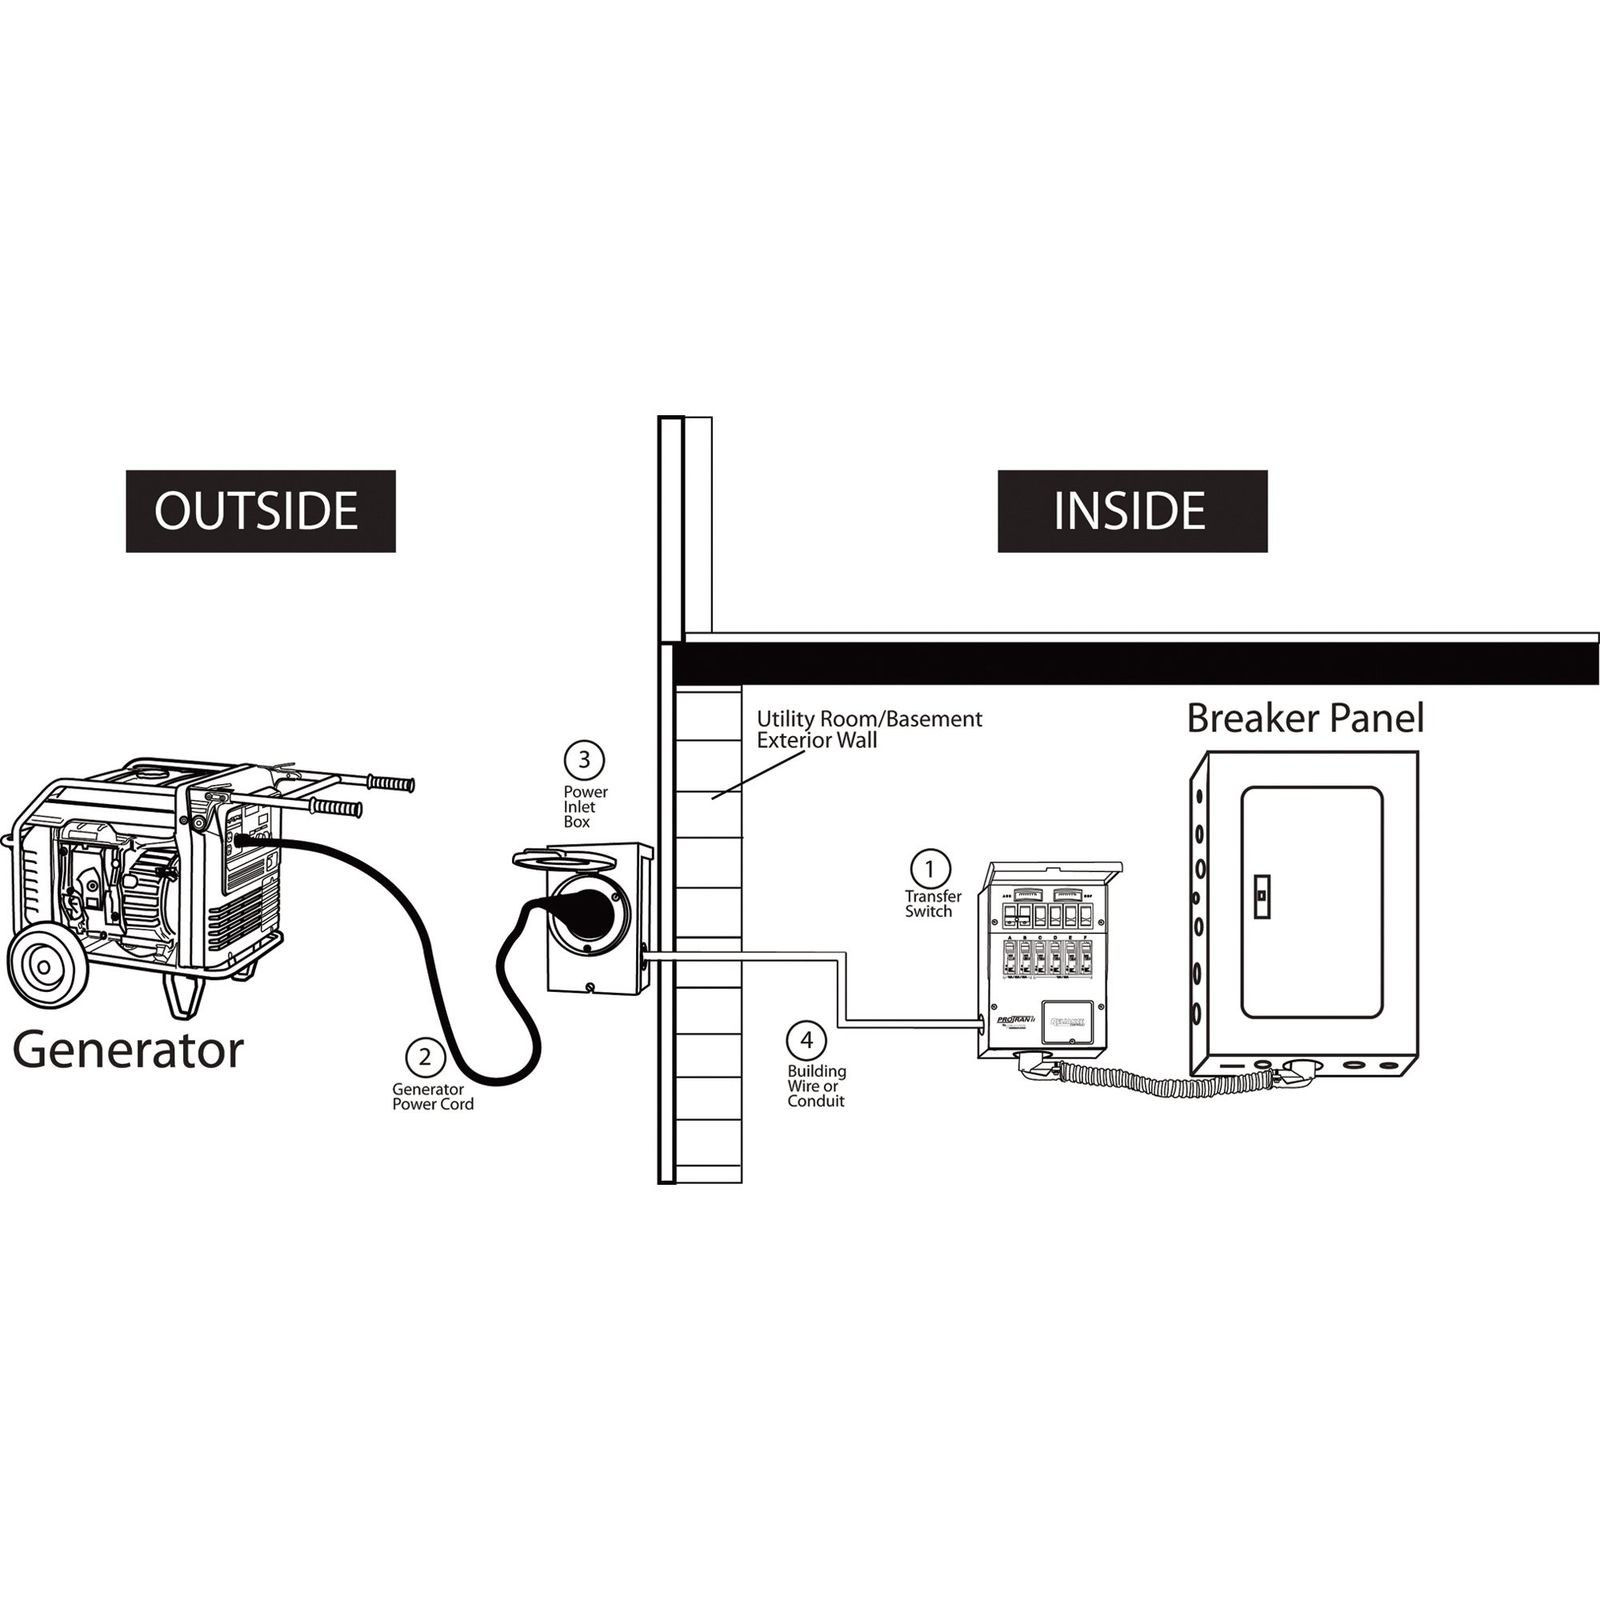 Reliance Transfer Switch Wiring Diagram | Wiring Diagram - Reliance Generator Transfer Switch Wiring Diagram